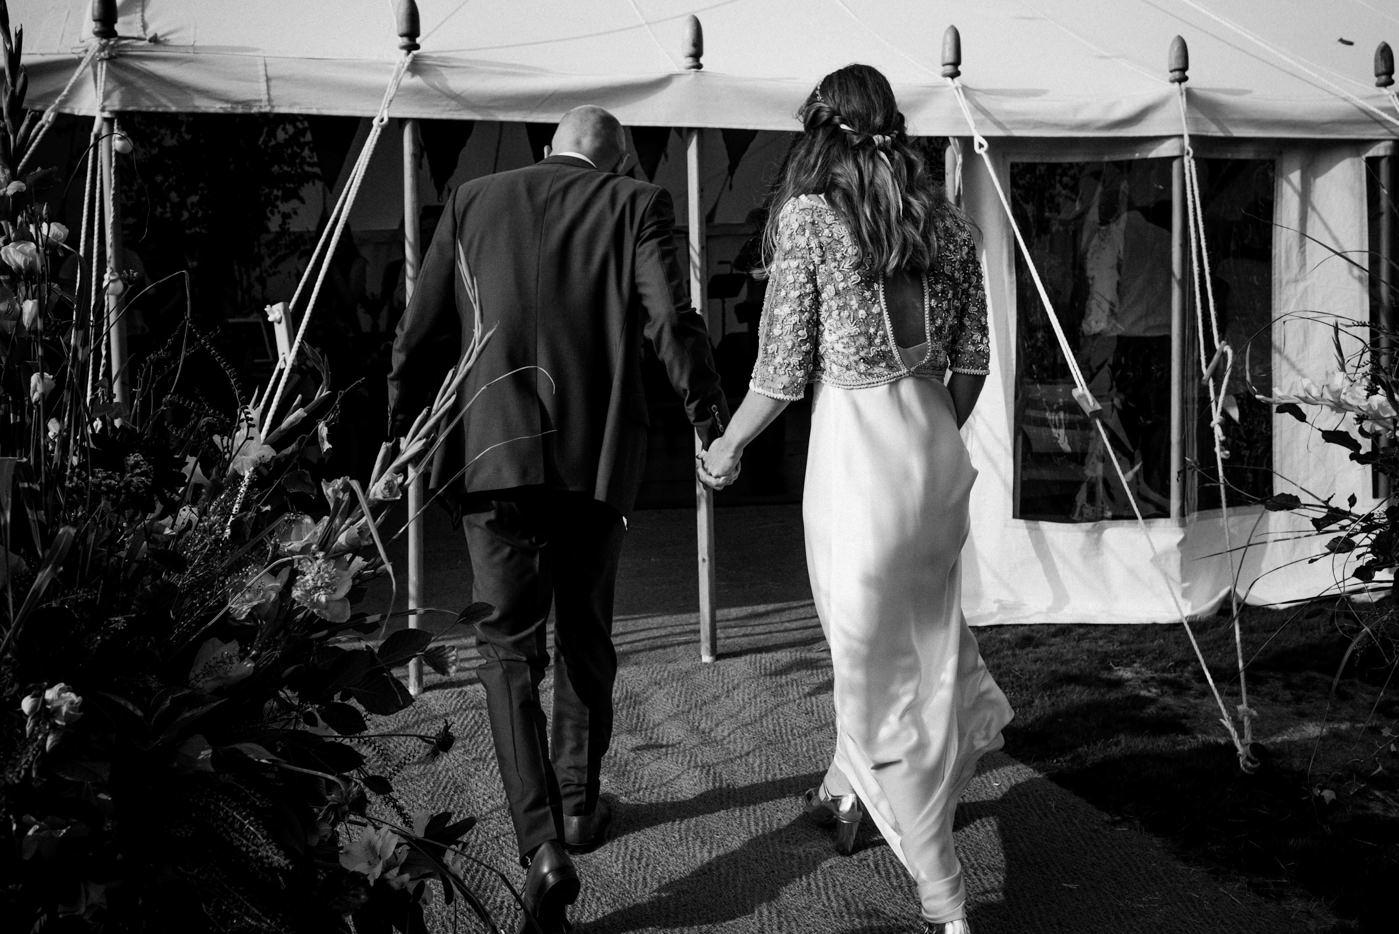 bignor-park-wedding-photography-robyn-and-tom-93